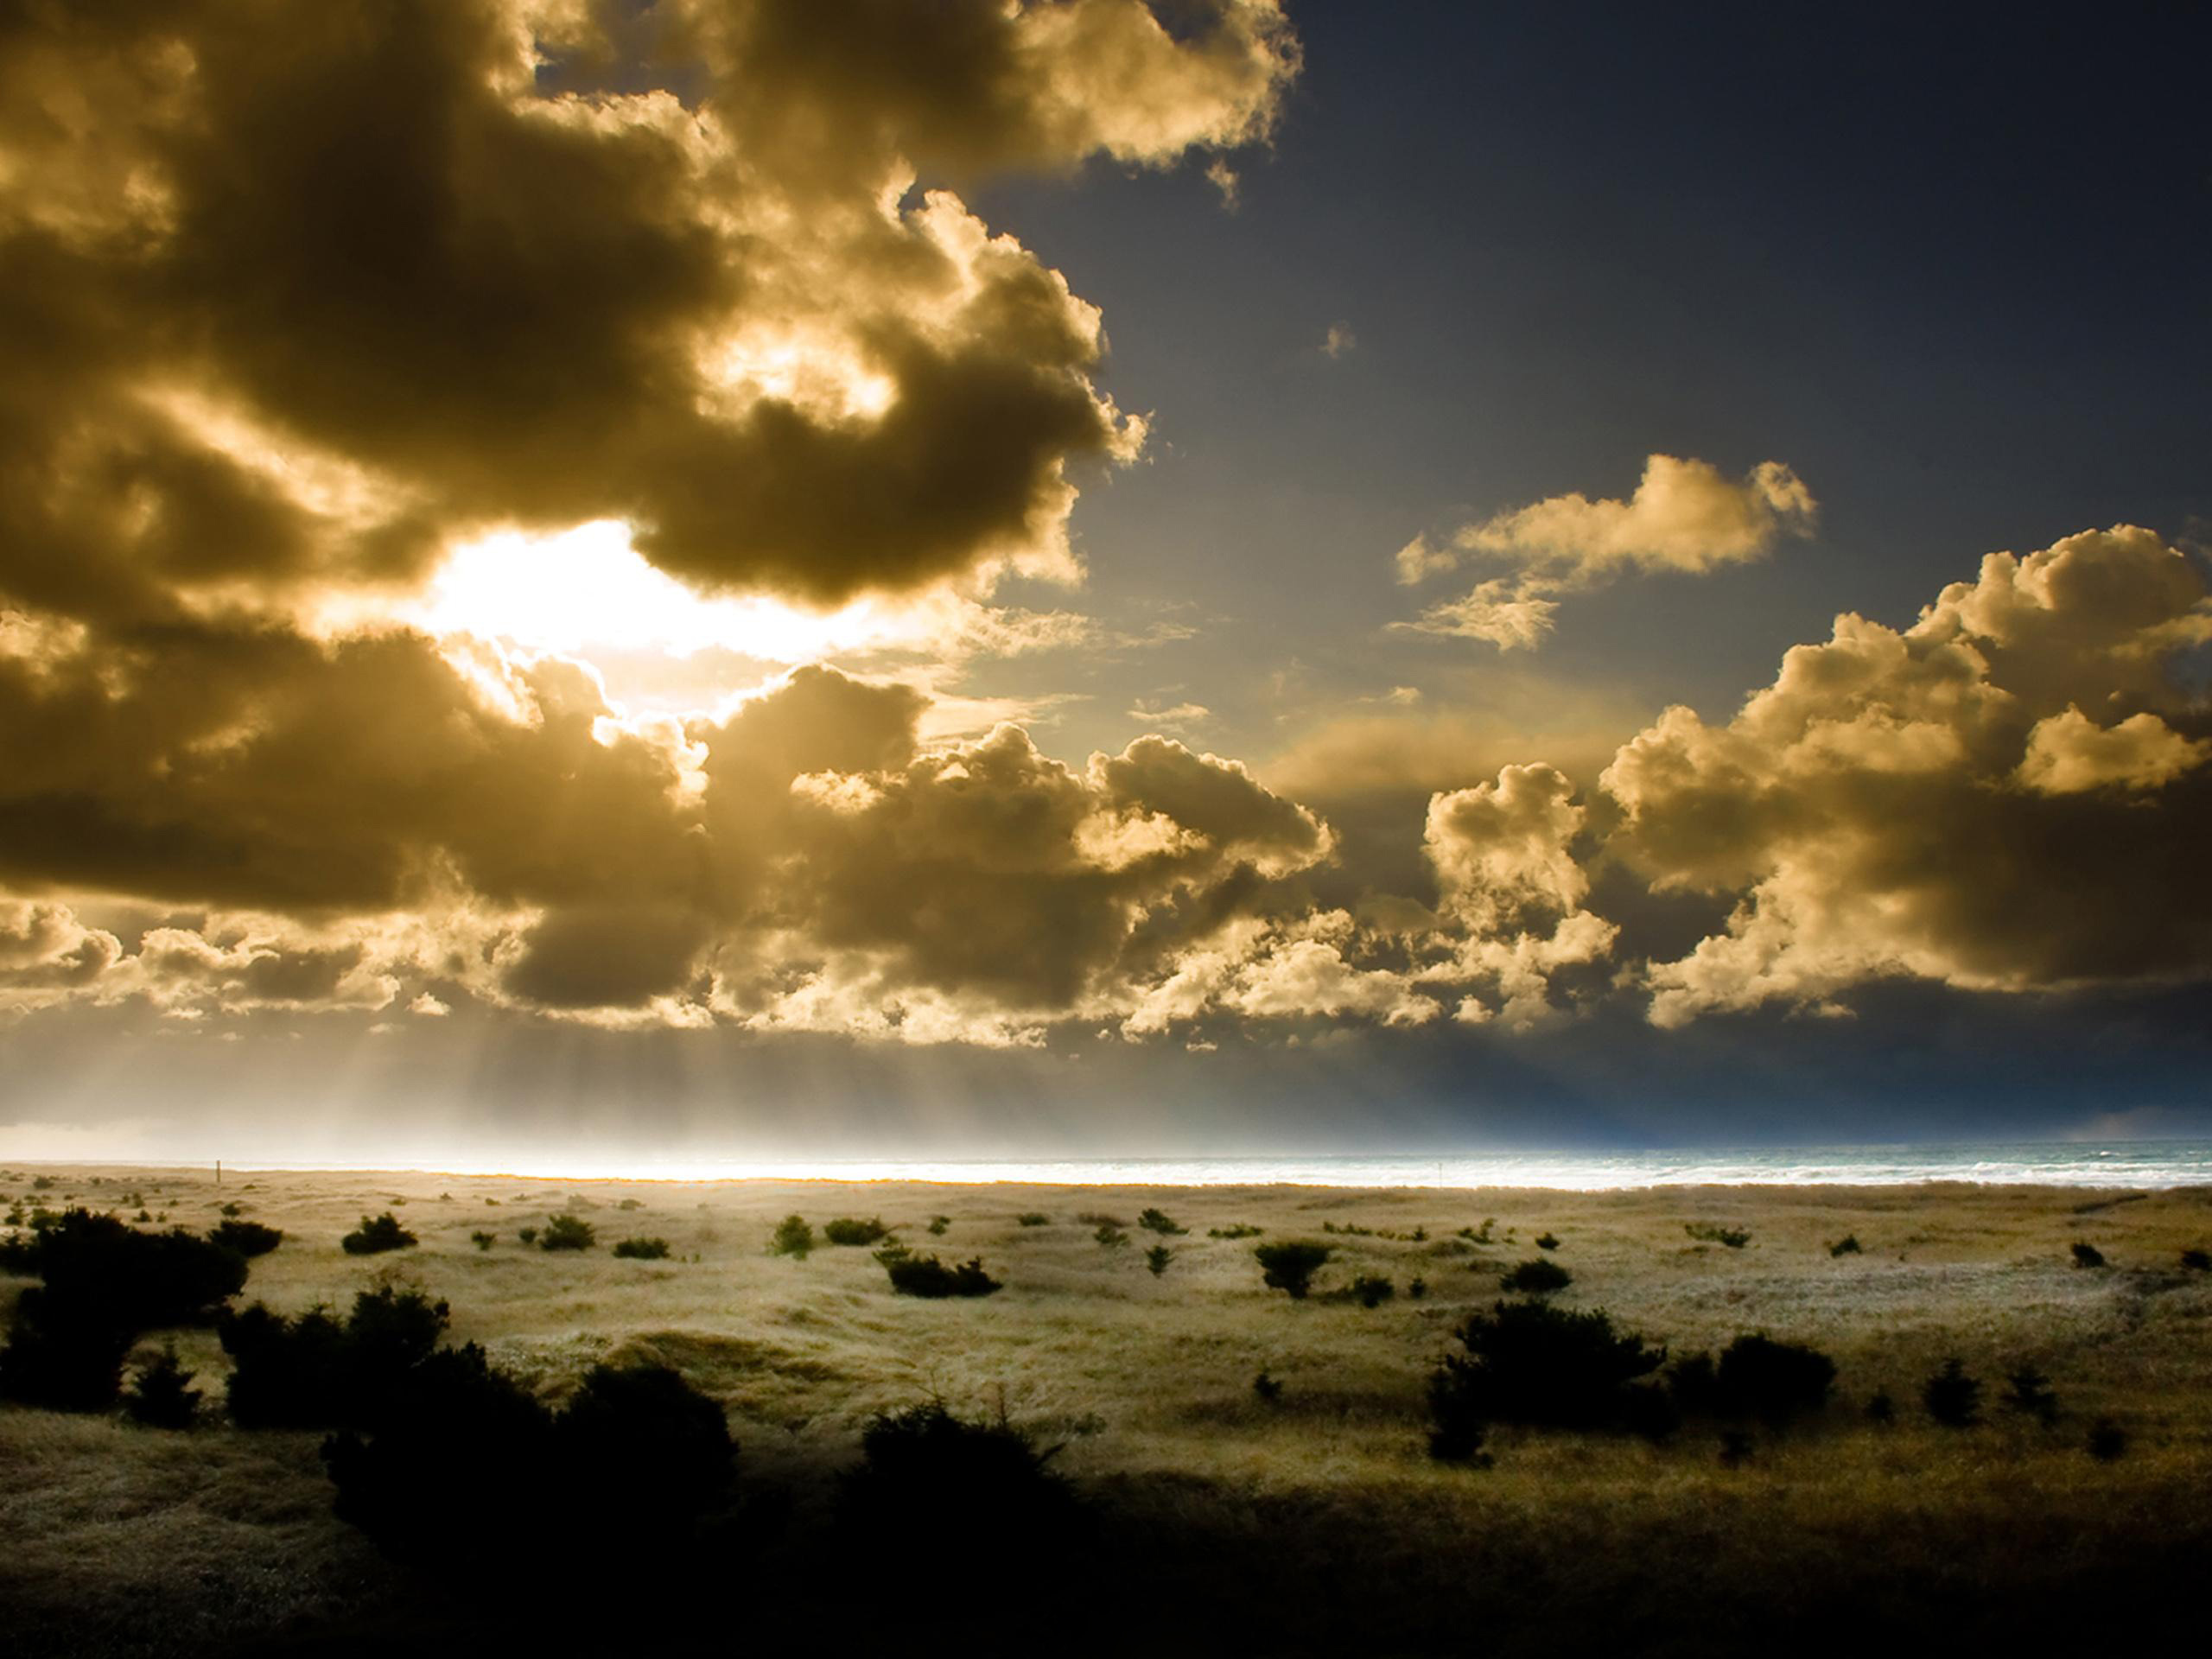 природа небо облака солнце горизонт  № 1275849 без смс